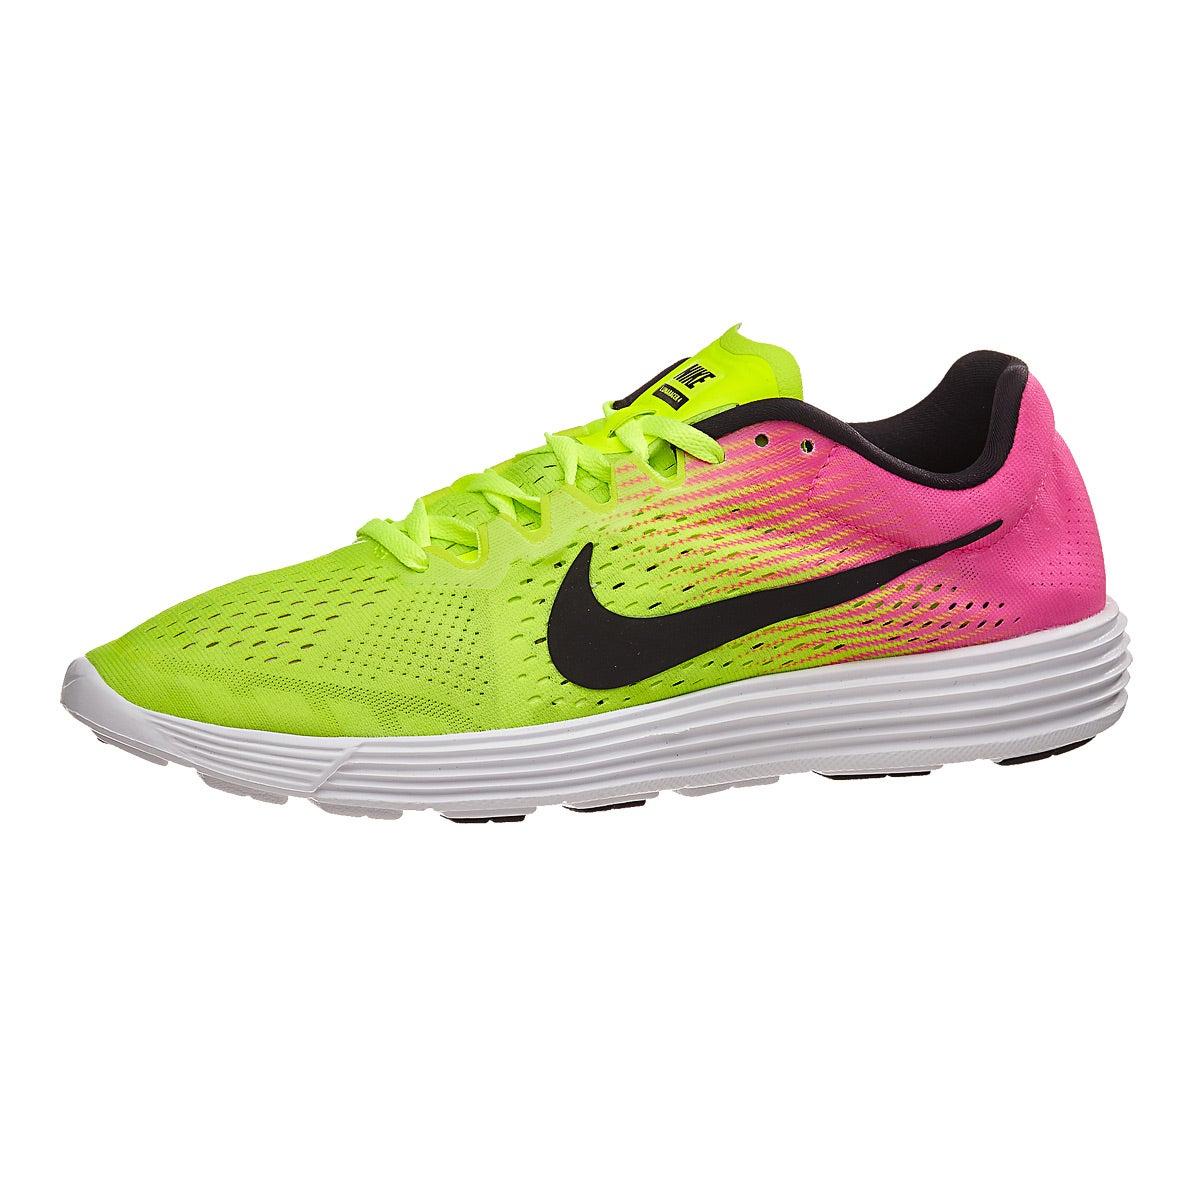 0c7594afd48 czech nike lunaracer 4 oc mens shoes multi color 360 view running  warehouse. 4c41b c86ea